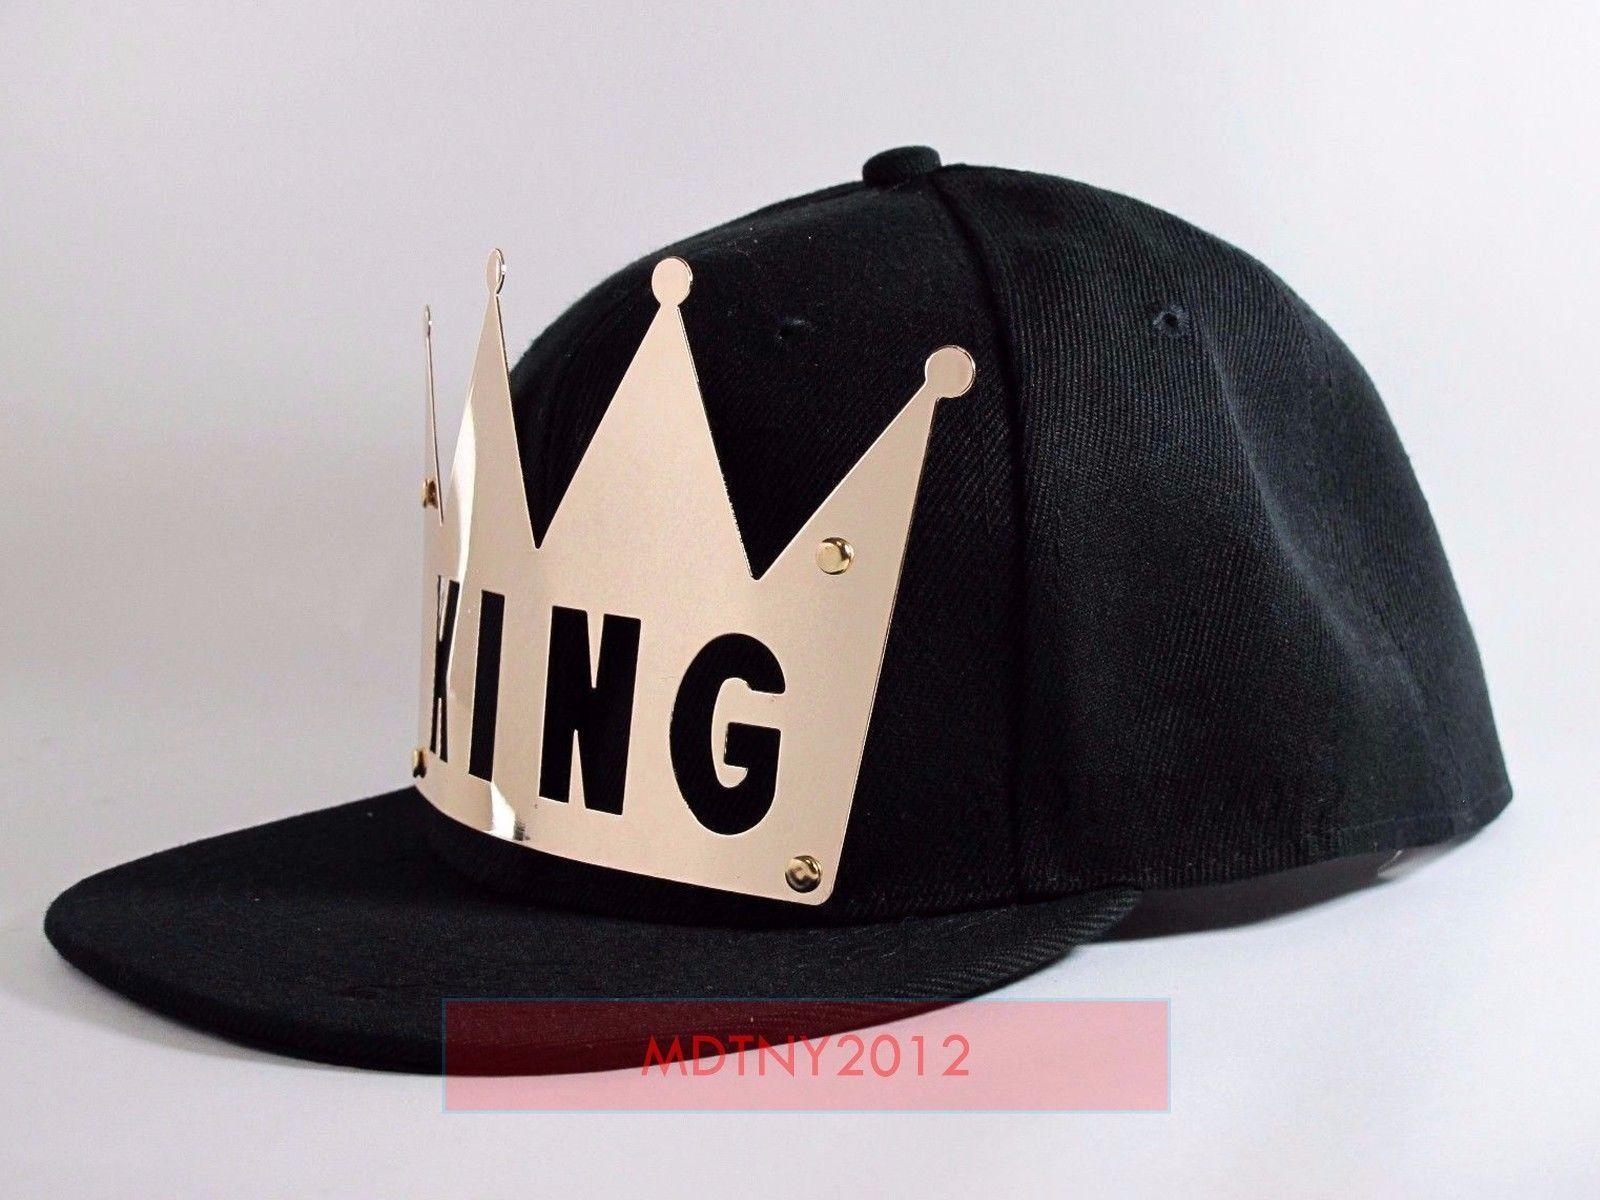 NEW Crown KING/&QUEEN Snapback Hats Baseball Caps adjustable Hip Hop Hats BLACK